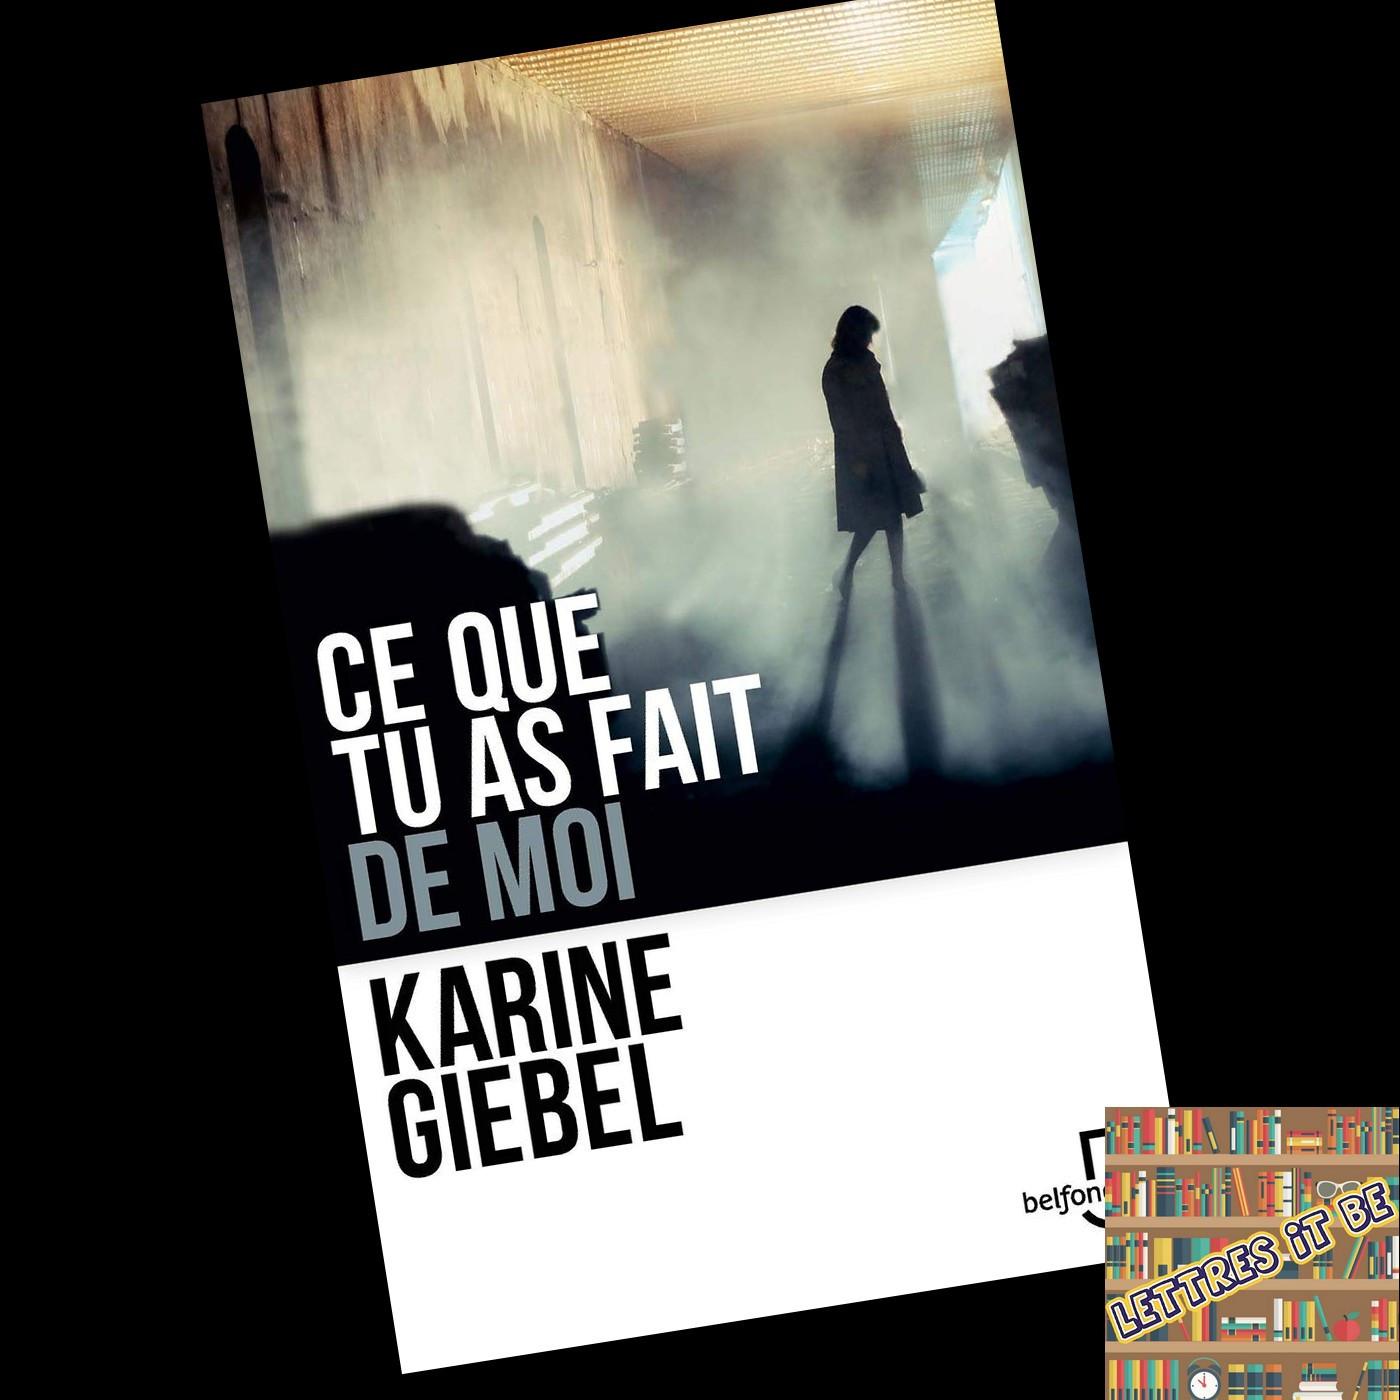 Critique de Ce que tu as fait de moi de Karine Giebel (Livre)